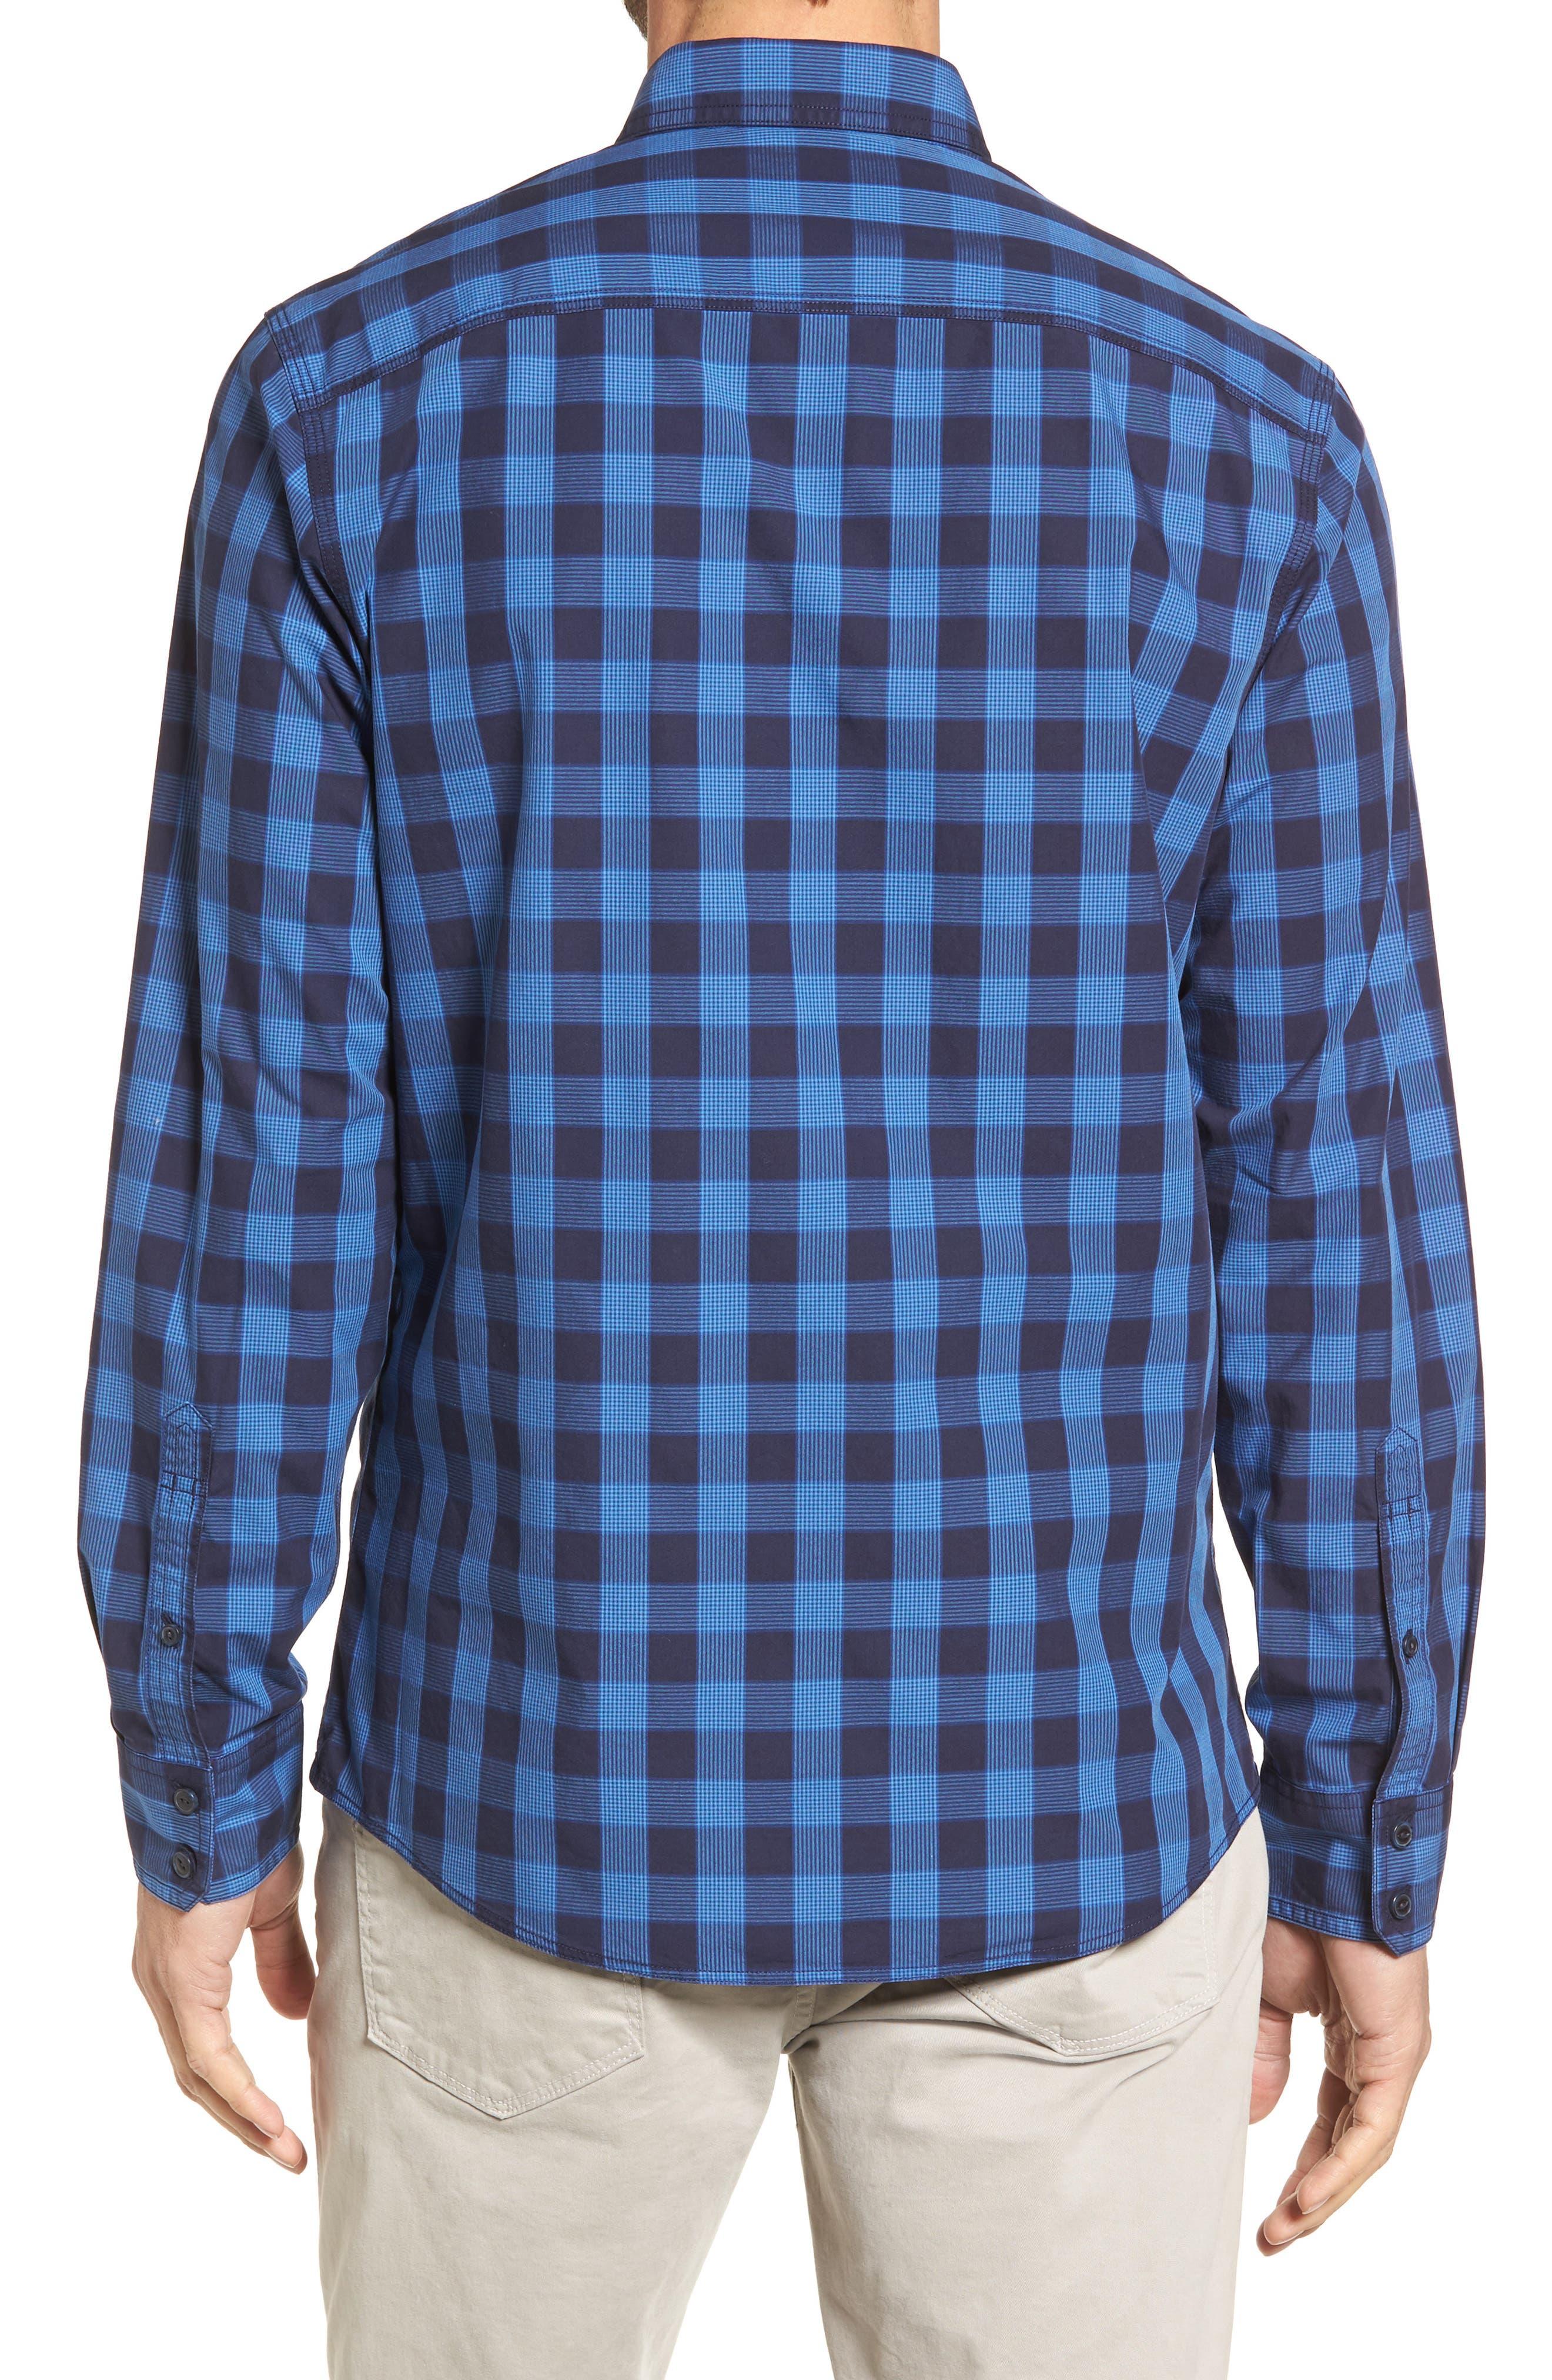 Trim Fit Plaid Trucker Sport Shirt,                             Alternate thumbnail 3, color,                             Navy Iris Blue Check